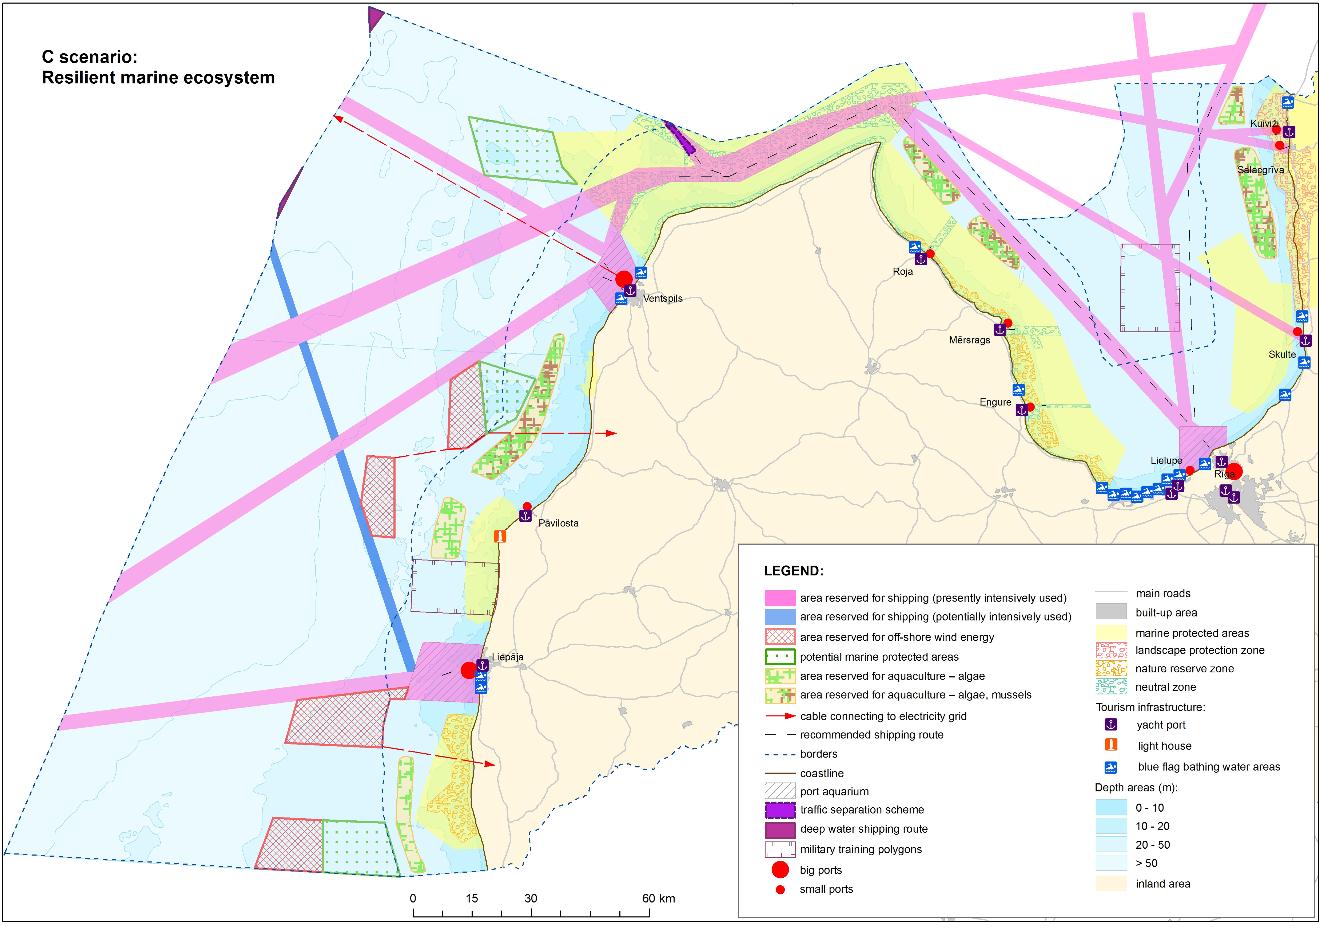 Scenario Resilient marine ecosystem